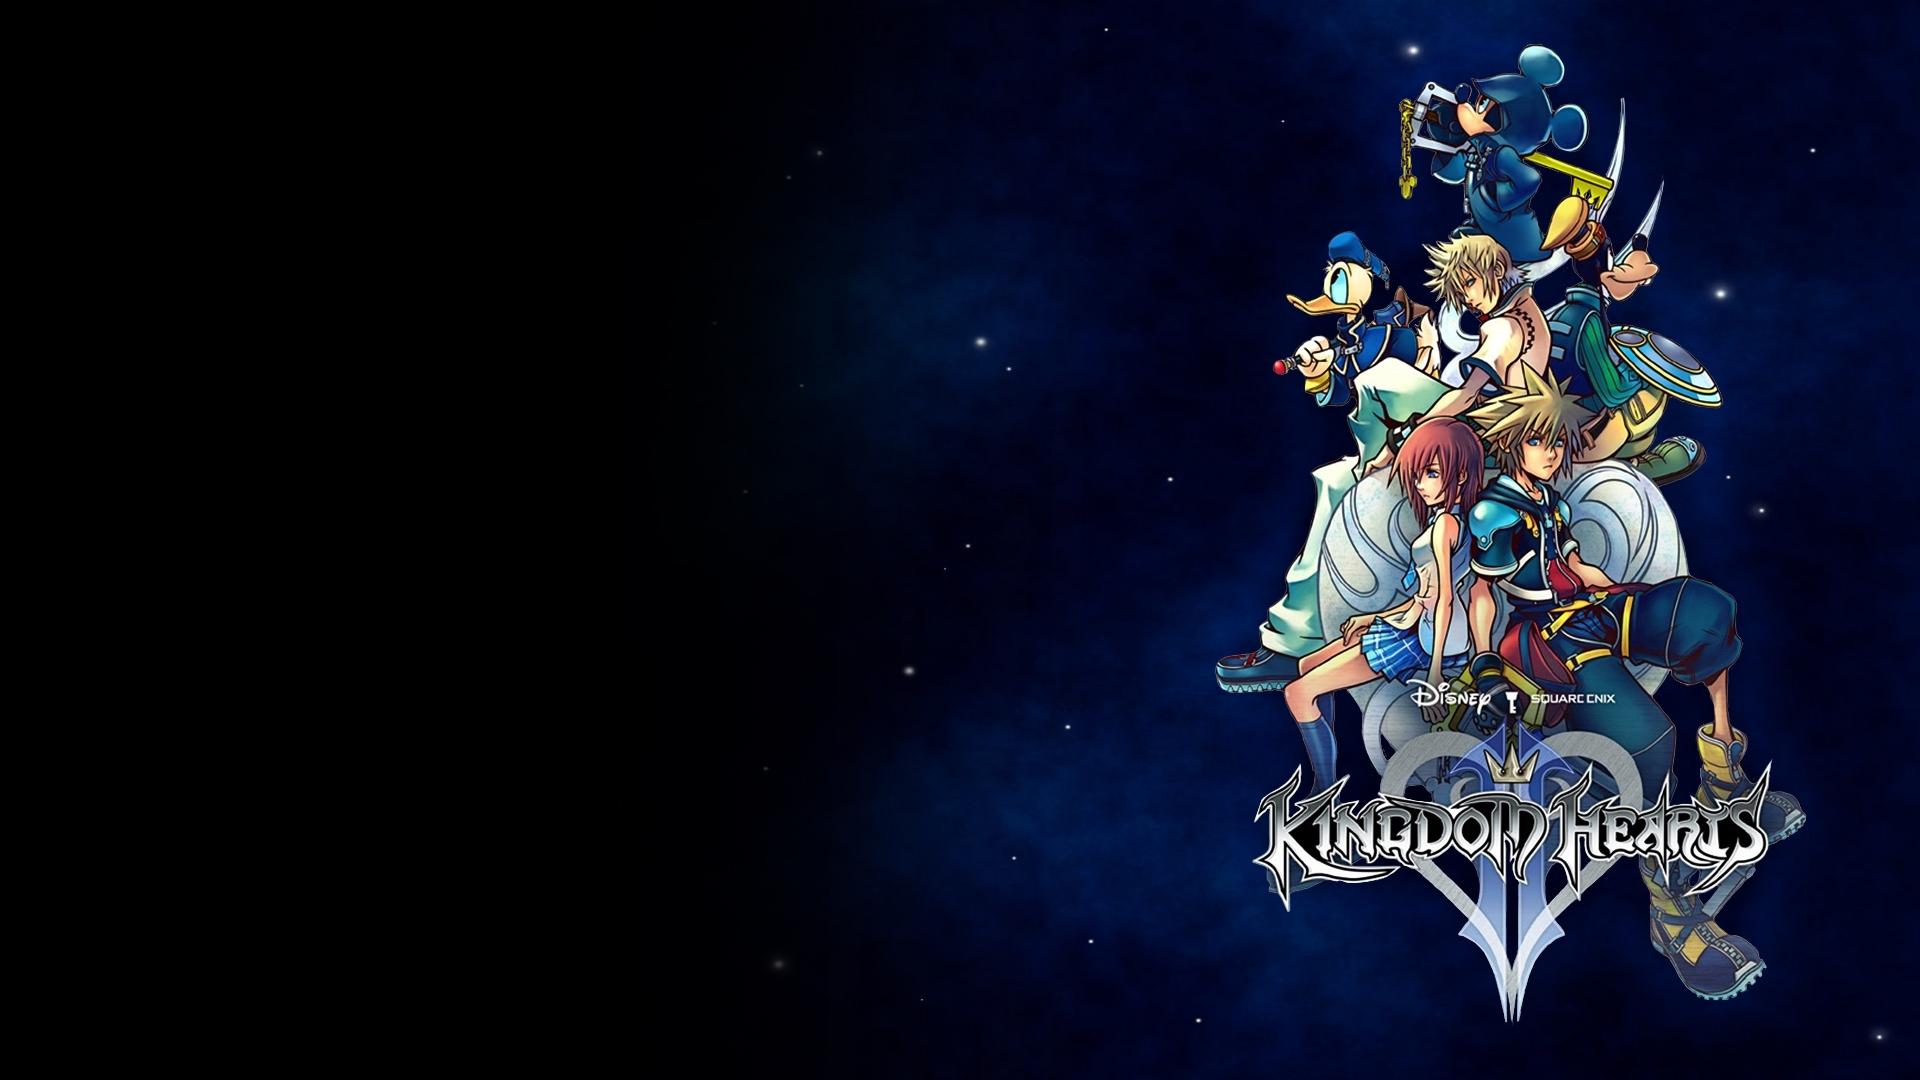 kingdom hearts games 1920x1080